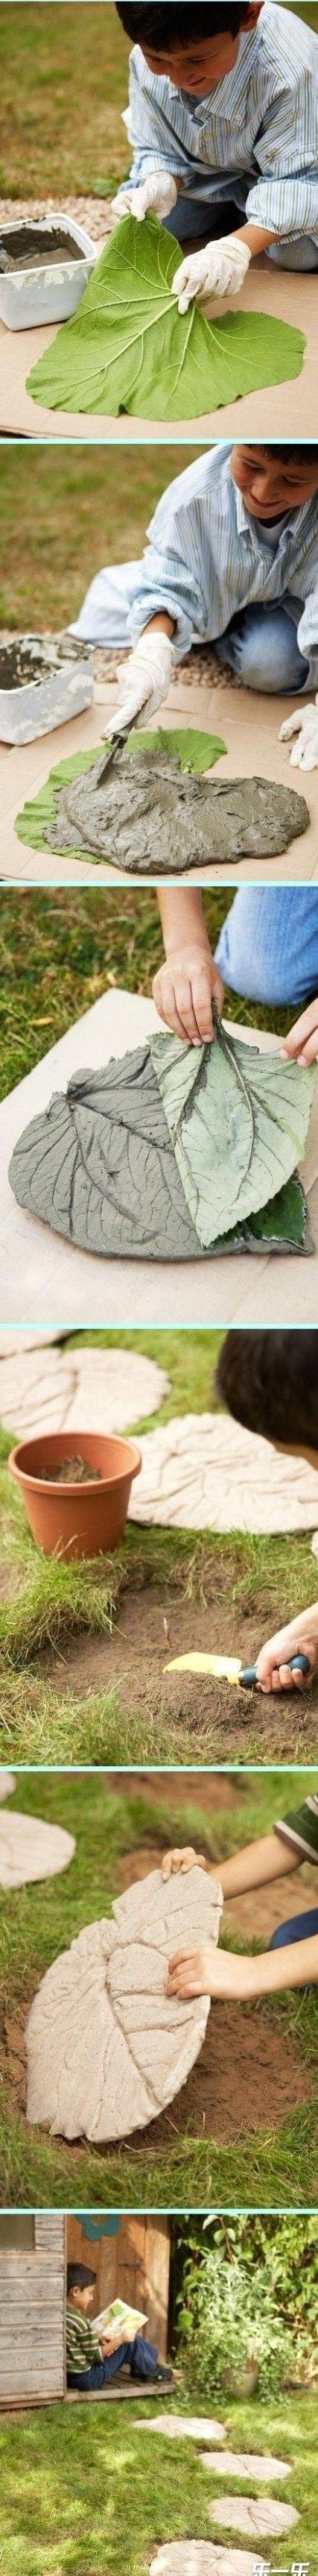 Gartendeko Zum Selbermachen 13 Ideen Mit Anleitungen Garten Deko Garten Diy Gartenbau